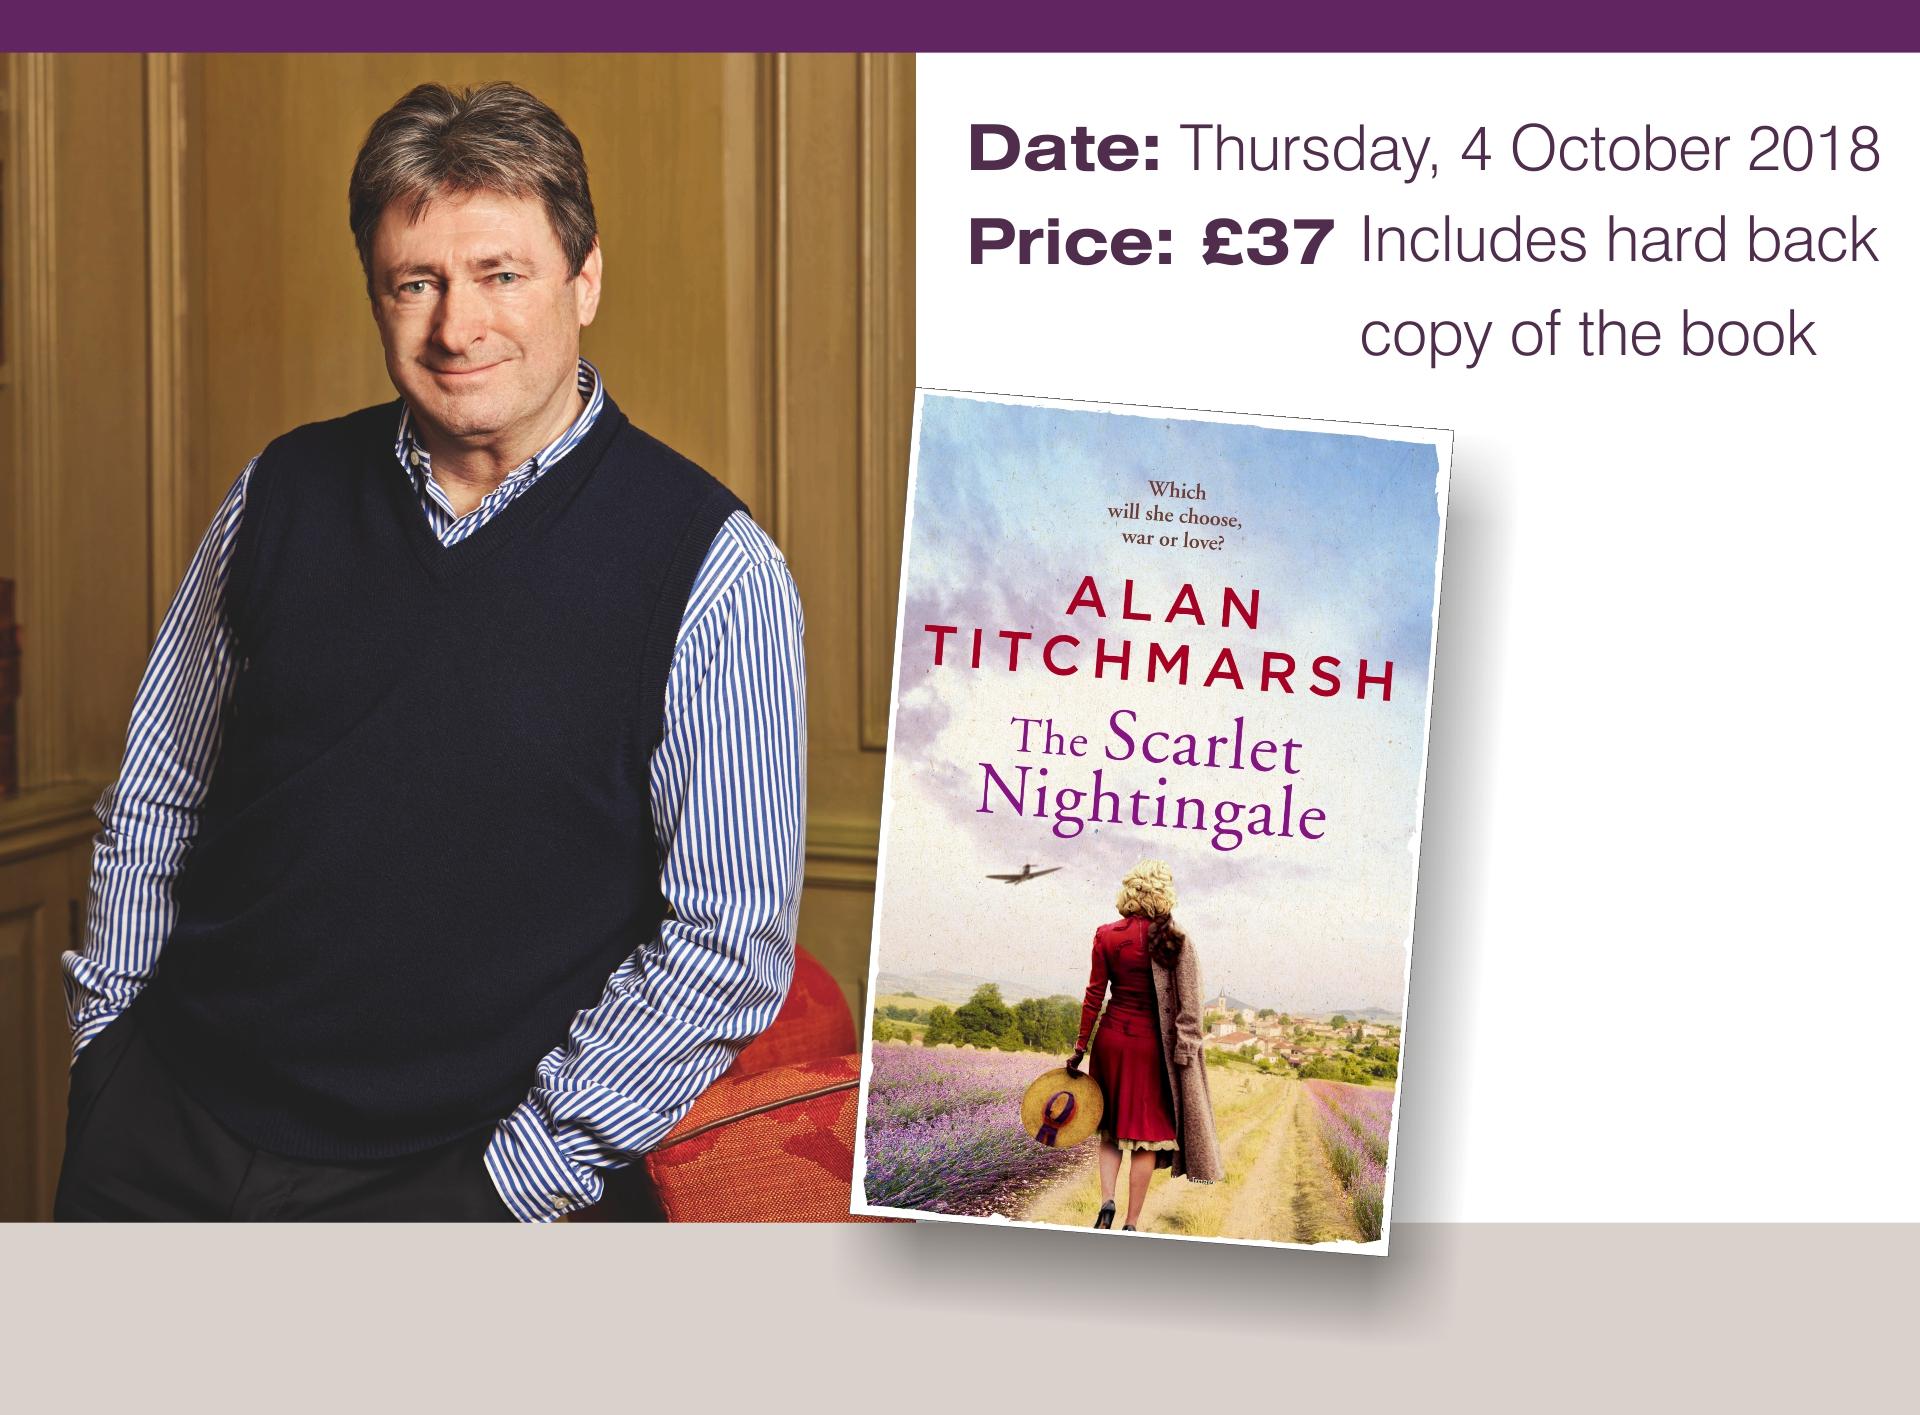 The Sarlet Nightingale by Alan Titchmarsh